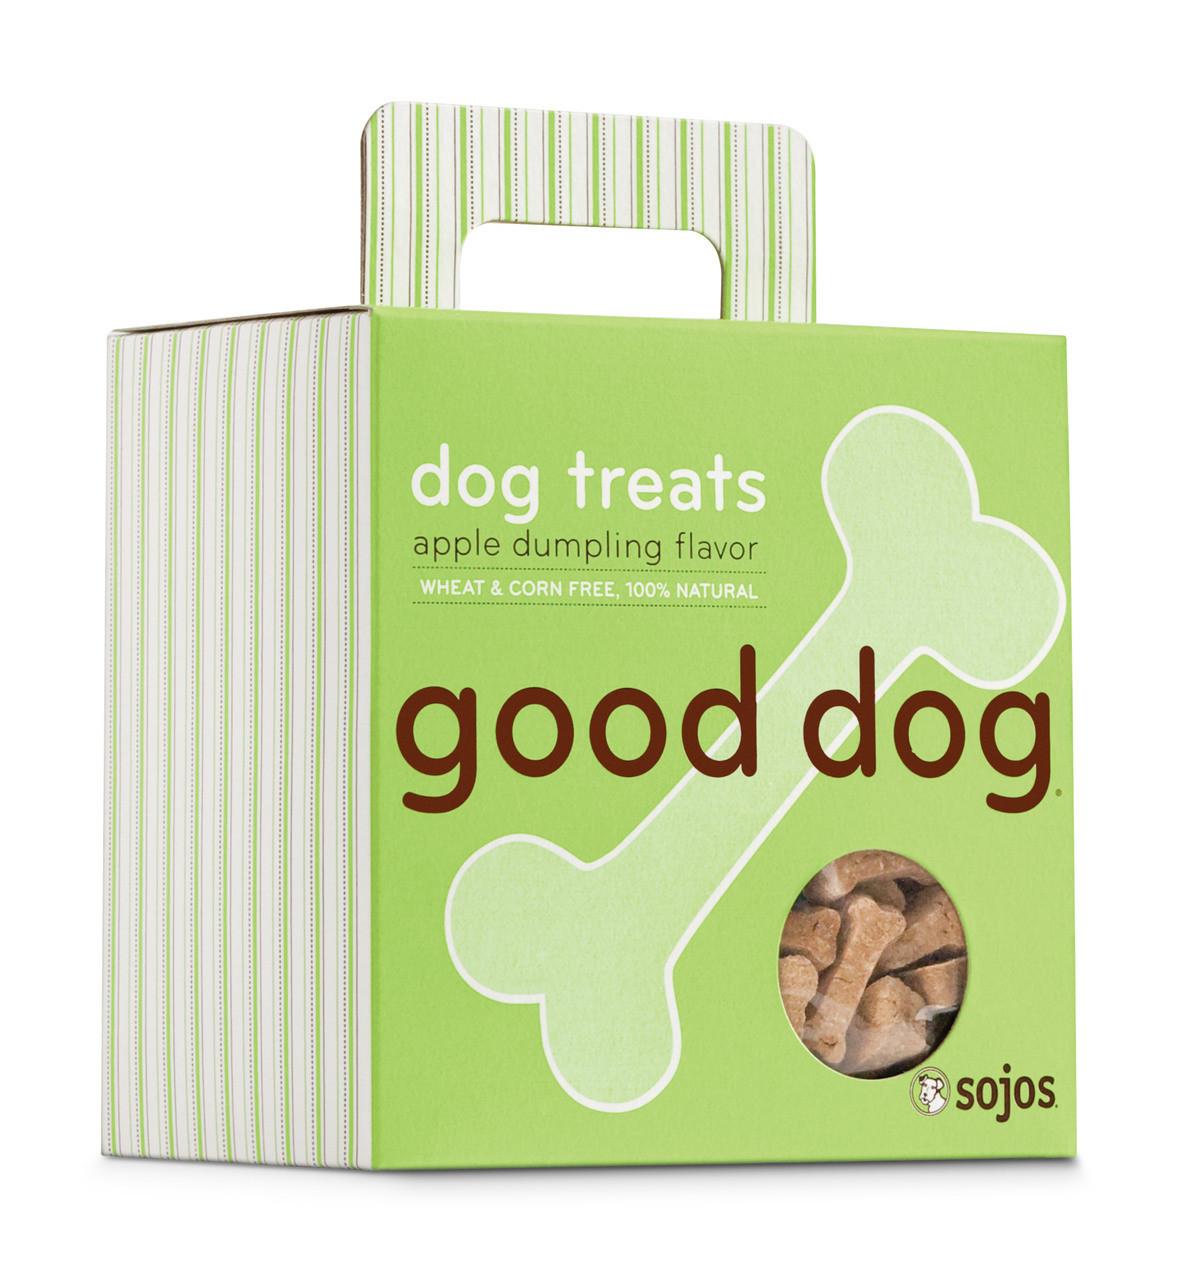 Good Dog Treats - Apple Dumpling